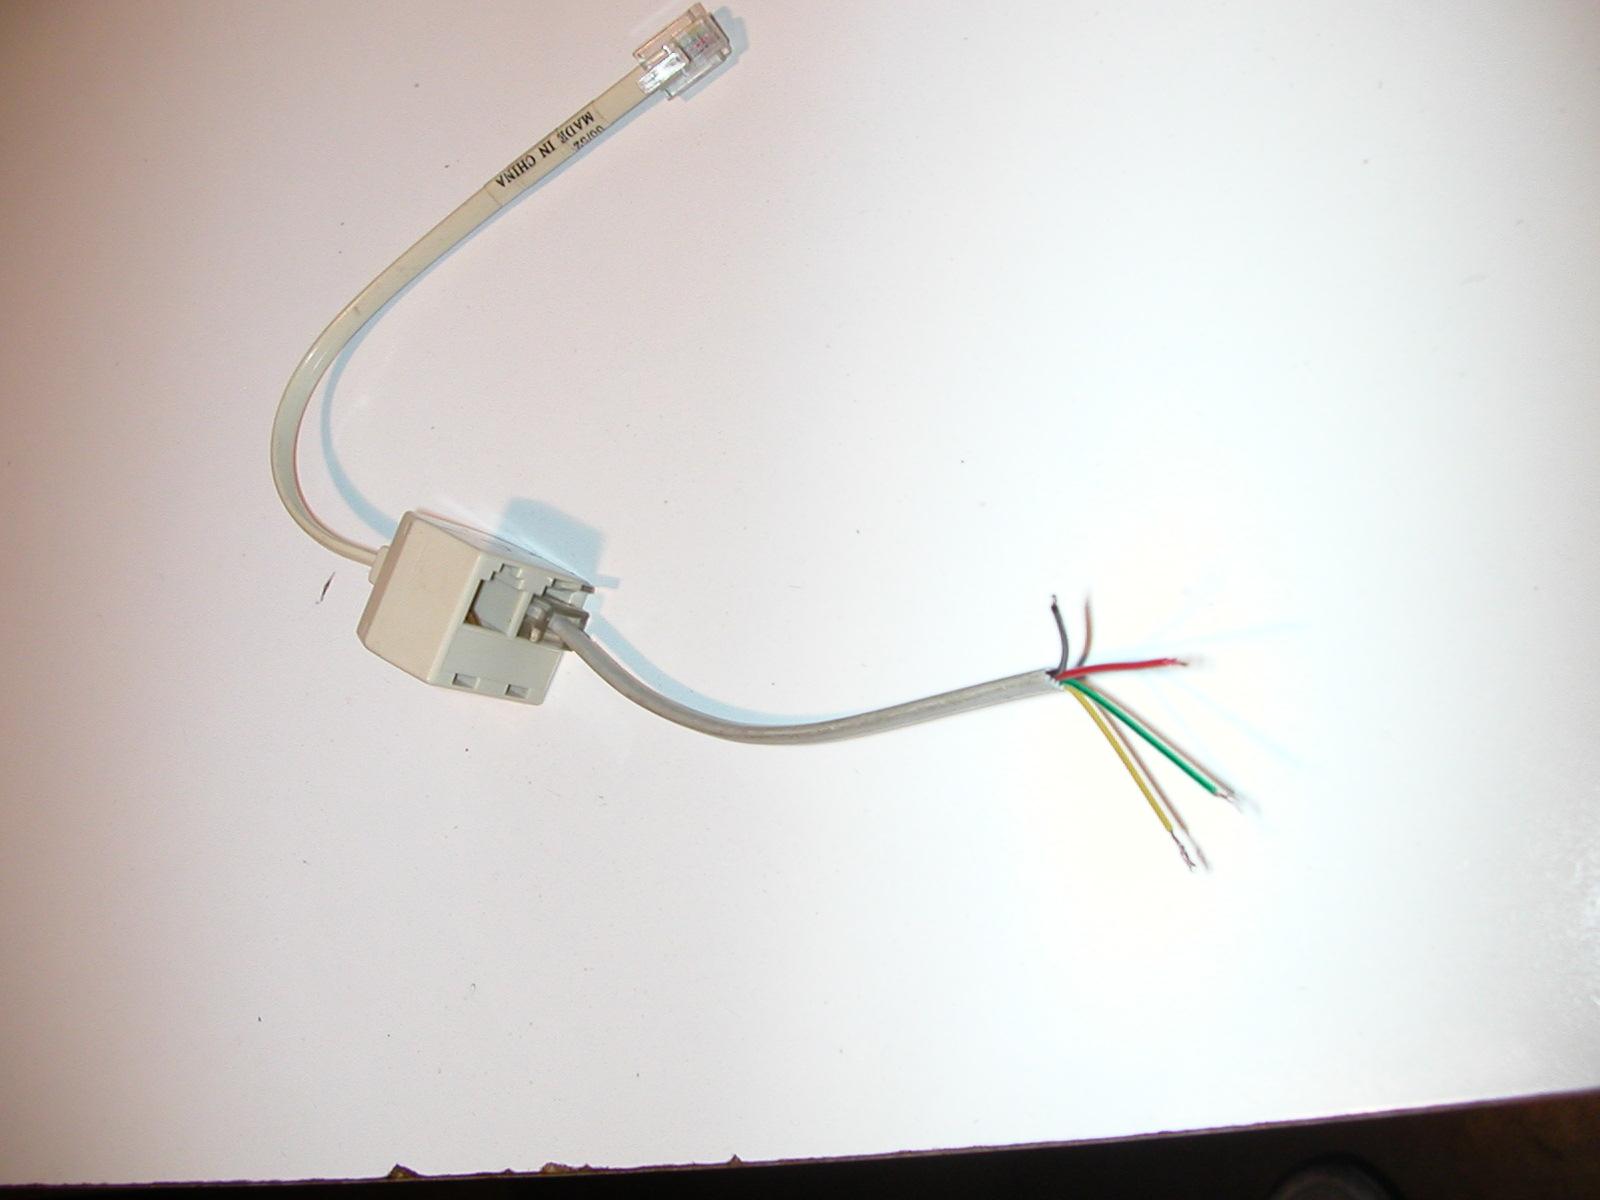 Anemometro Vantage pro in black out?-dscn6367.jpg